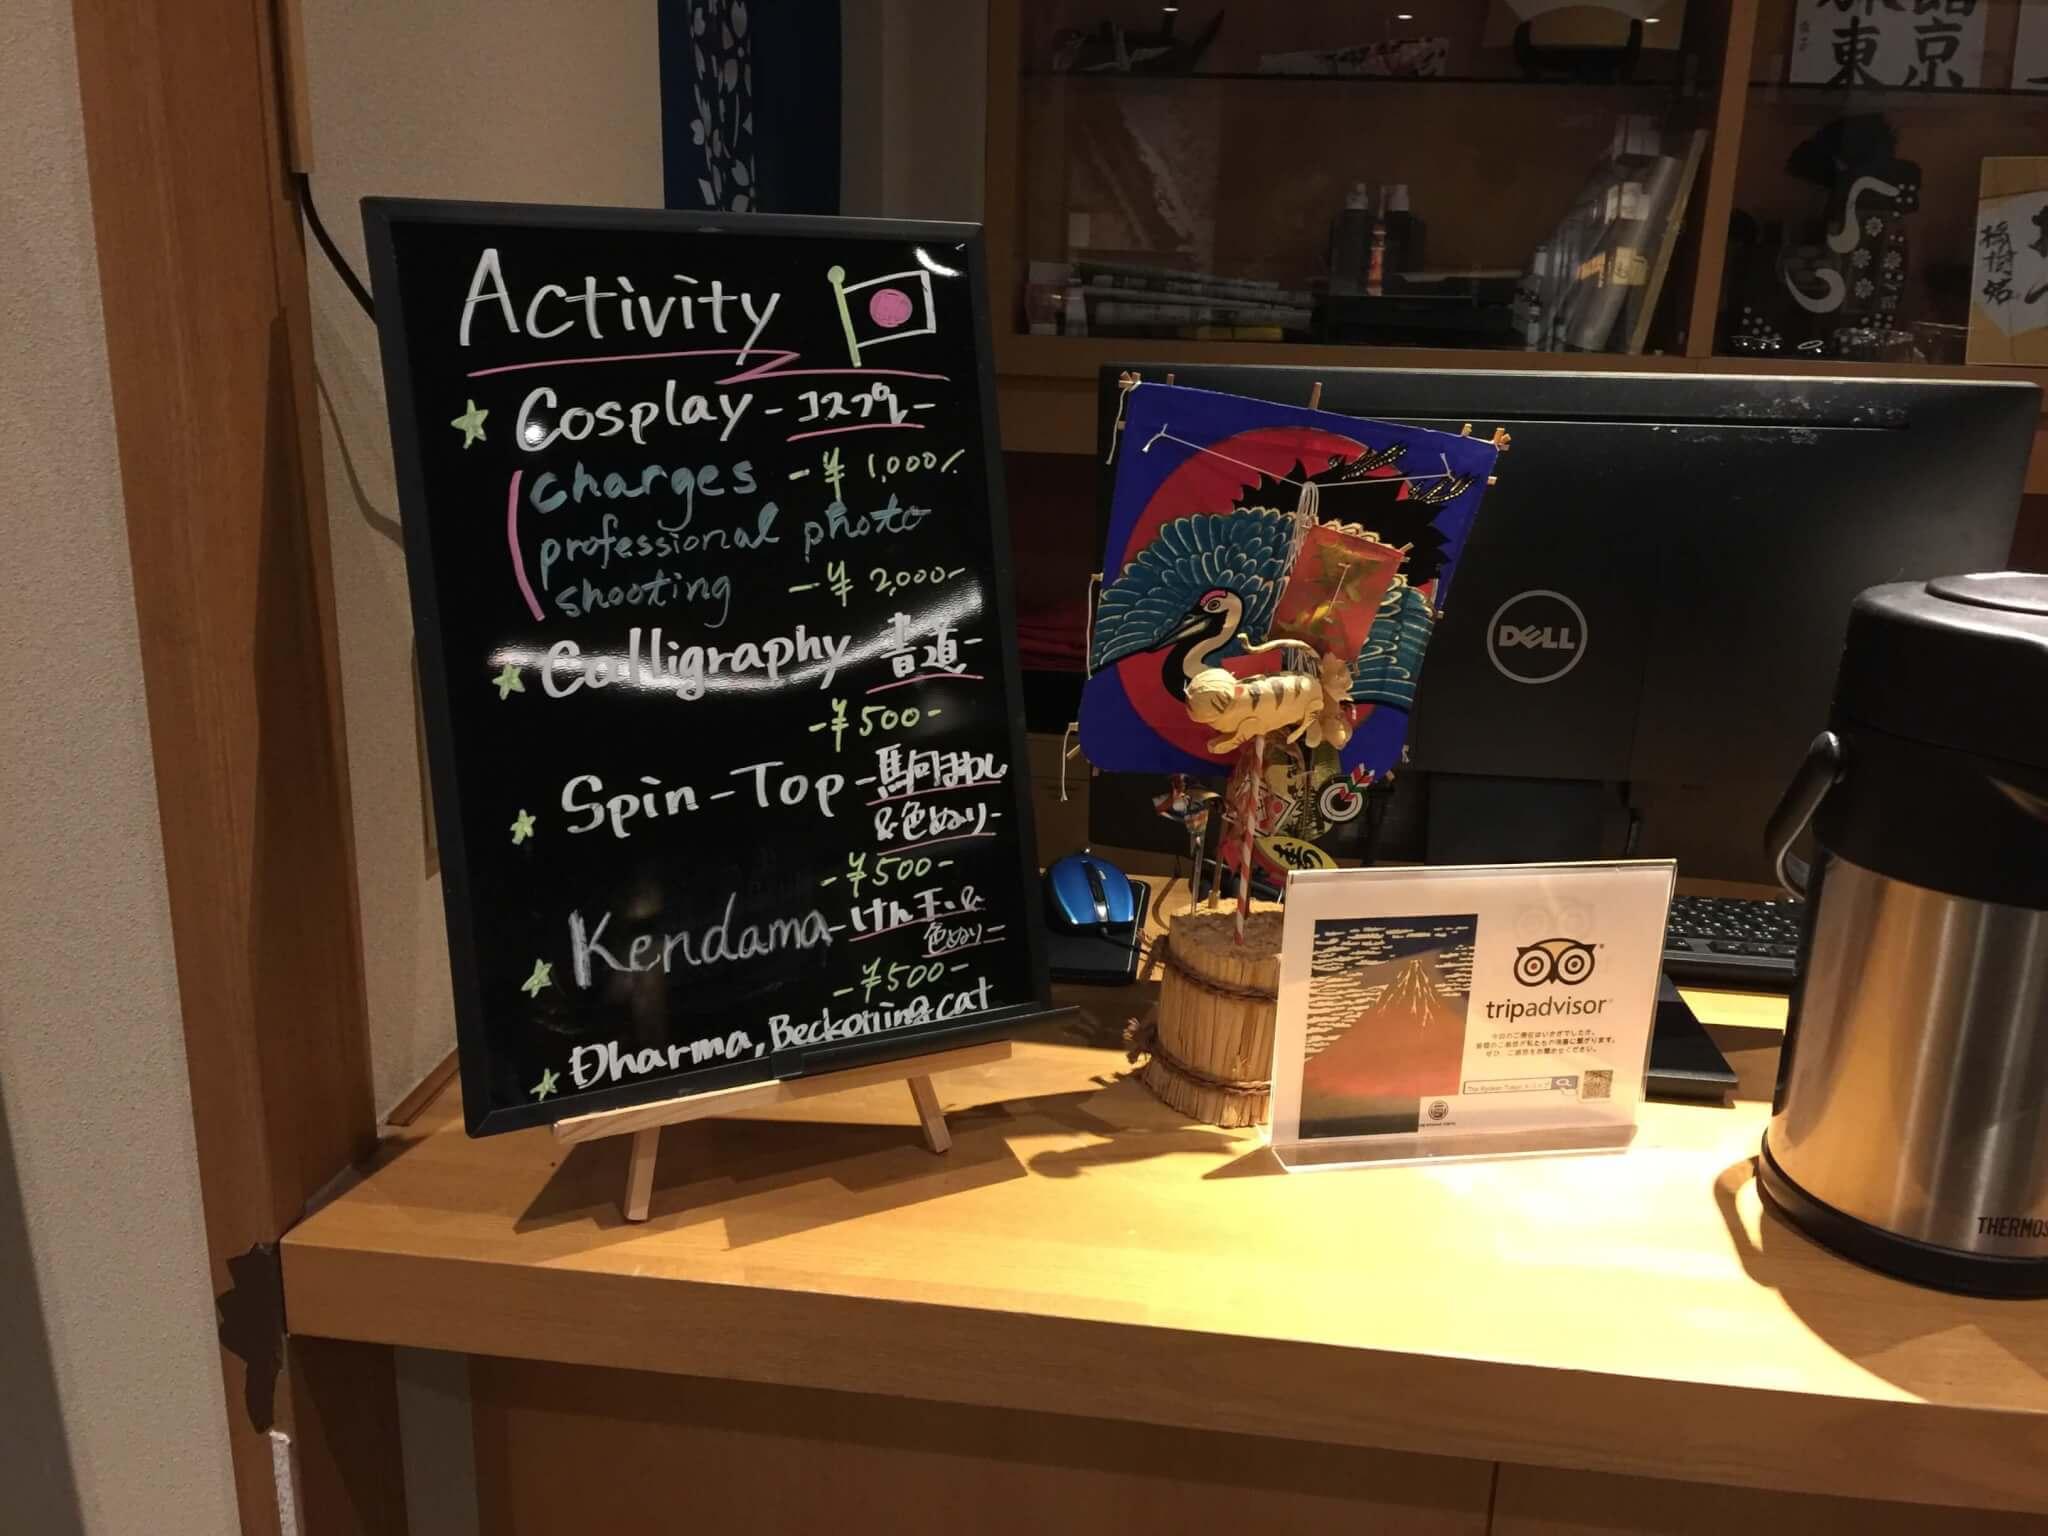 THE RYOKAN TOKYOでできるアクティビティリスト